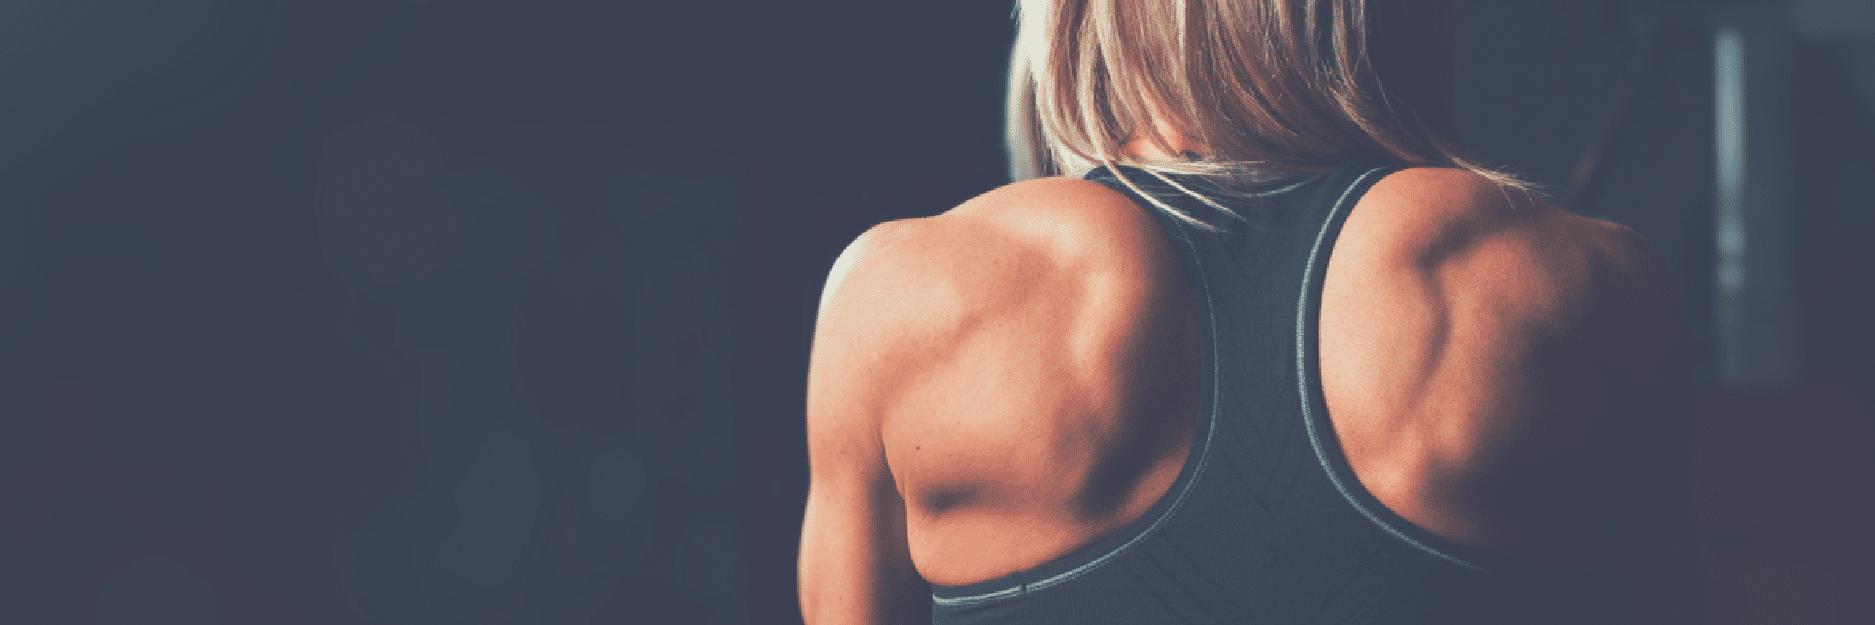 CrossFit & Pregnancy | 5pointpt